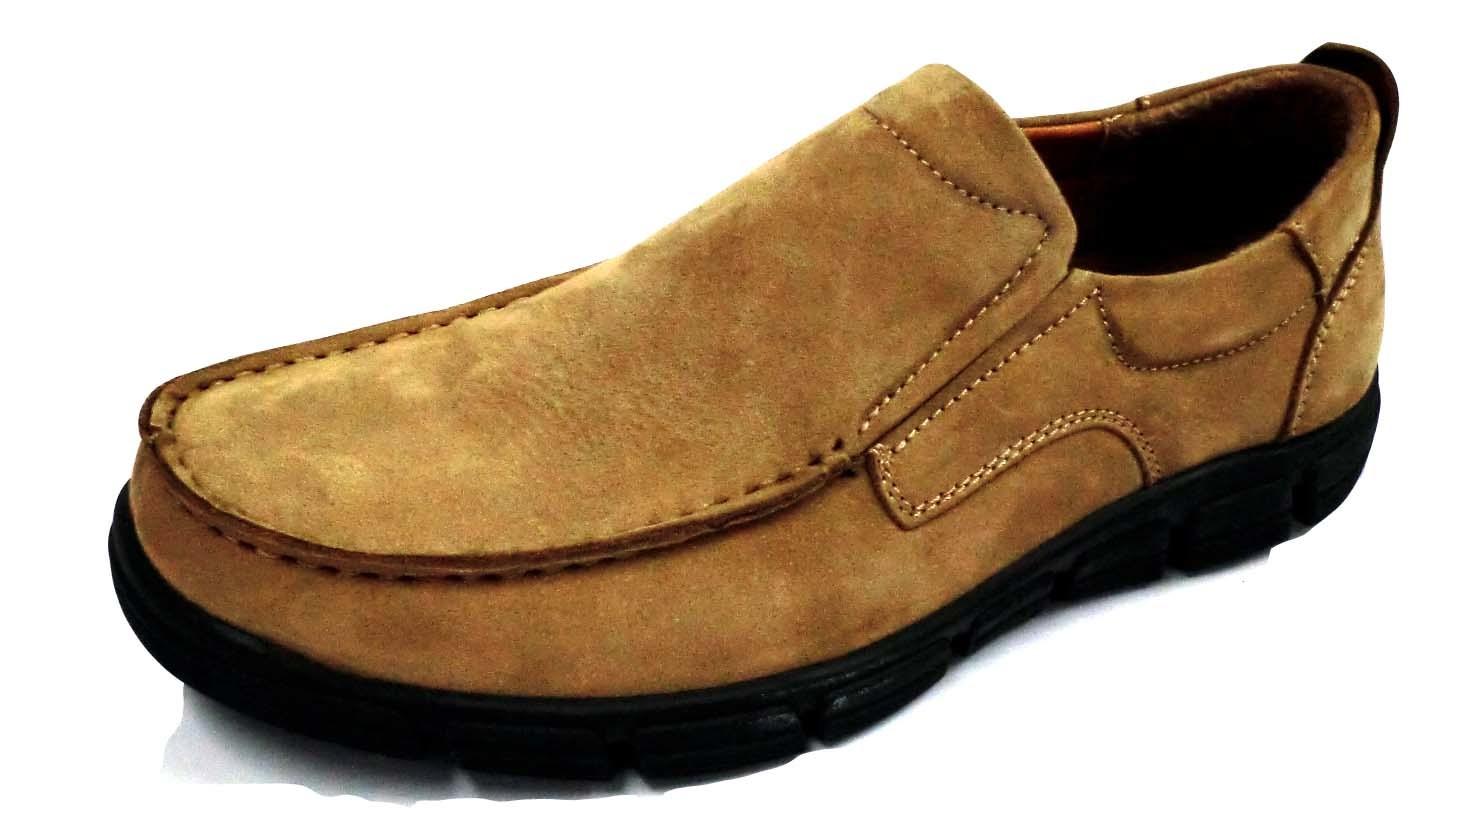 Woodland Khaki Men Casual Shoes - GC 0580108Y13_View_1/fashion/casuals/woodland-khaki